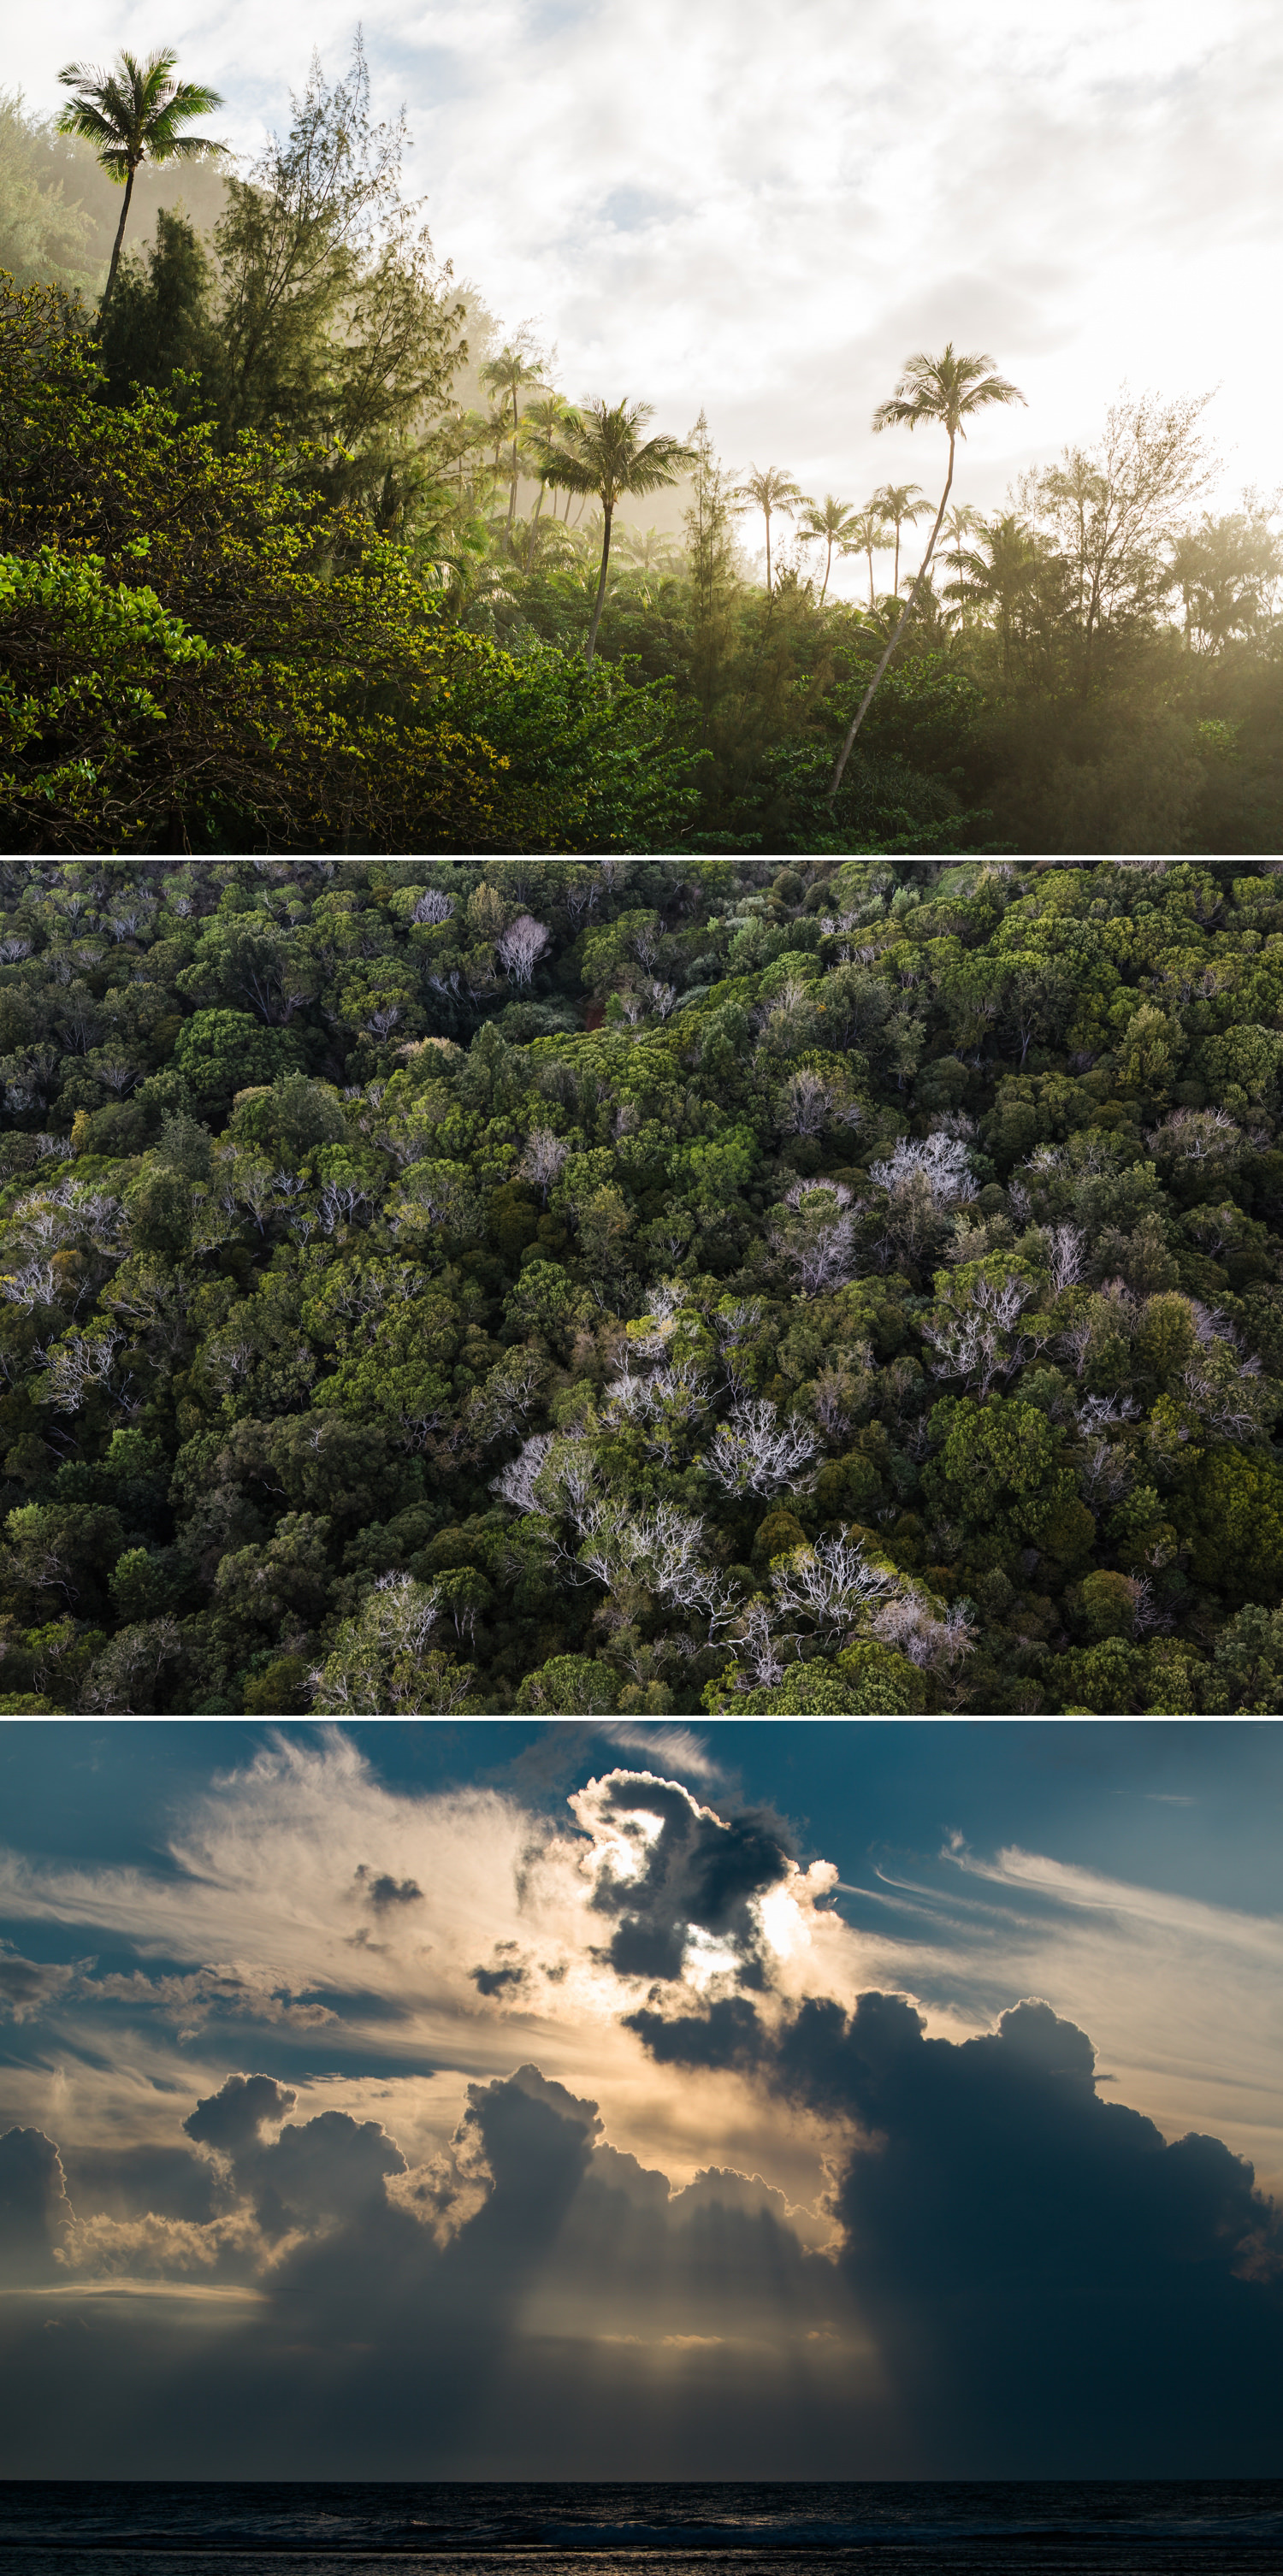 cameron-zegers-photography-travel-hawaii-kauai-12.jpg